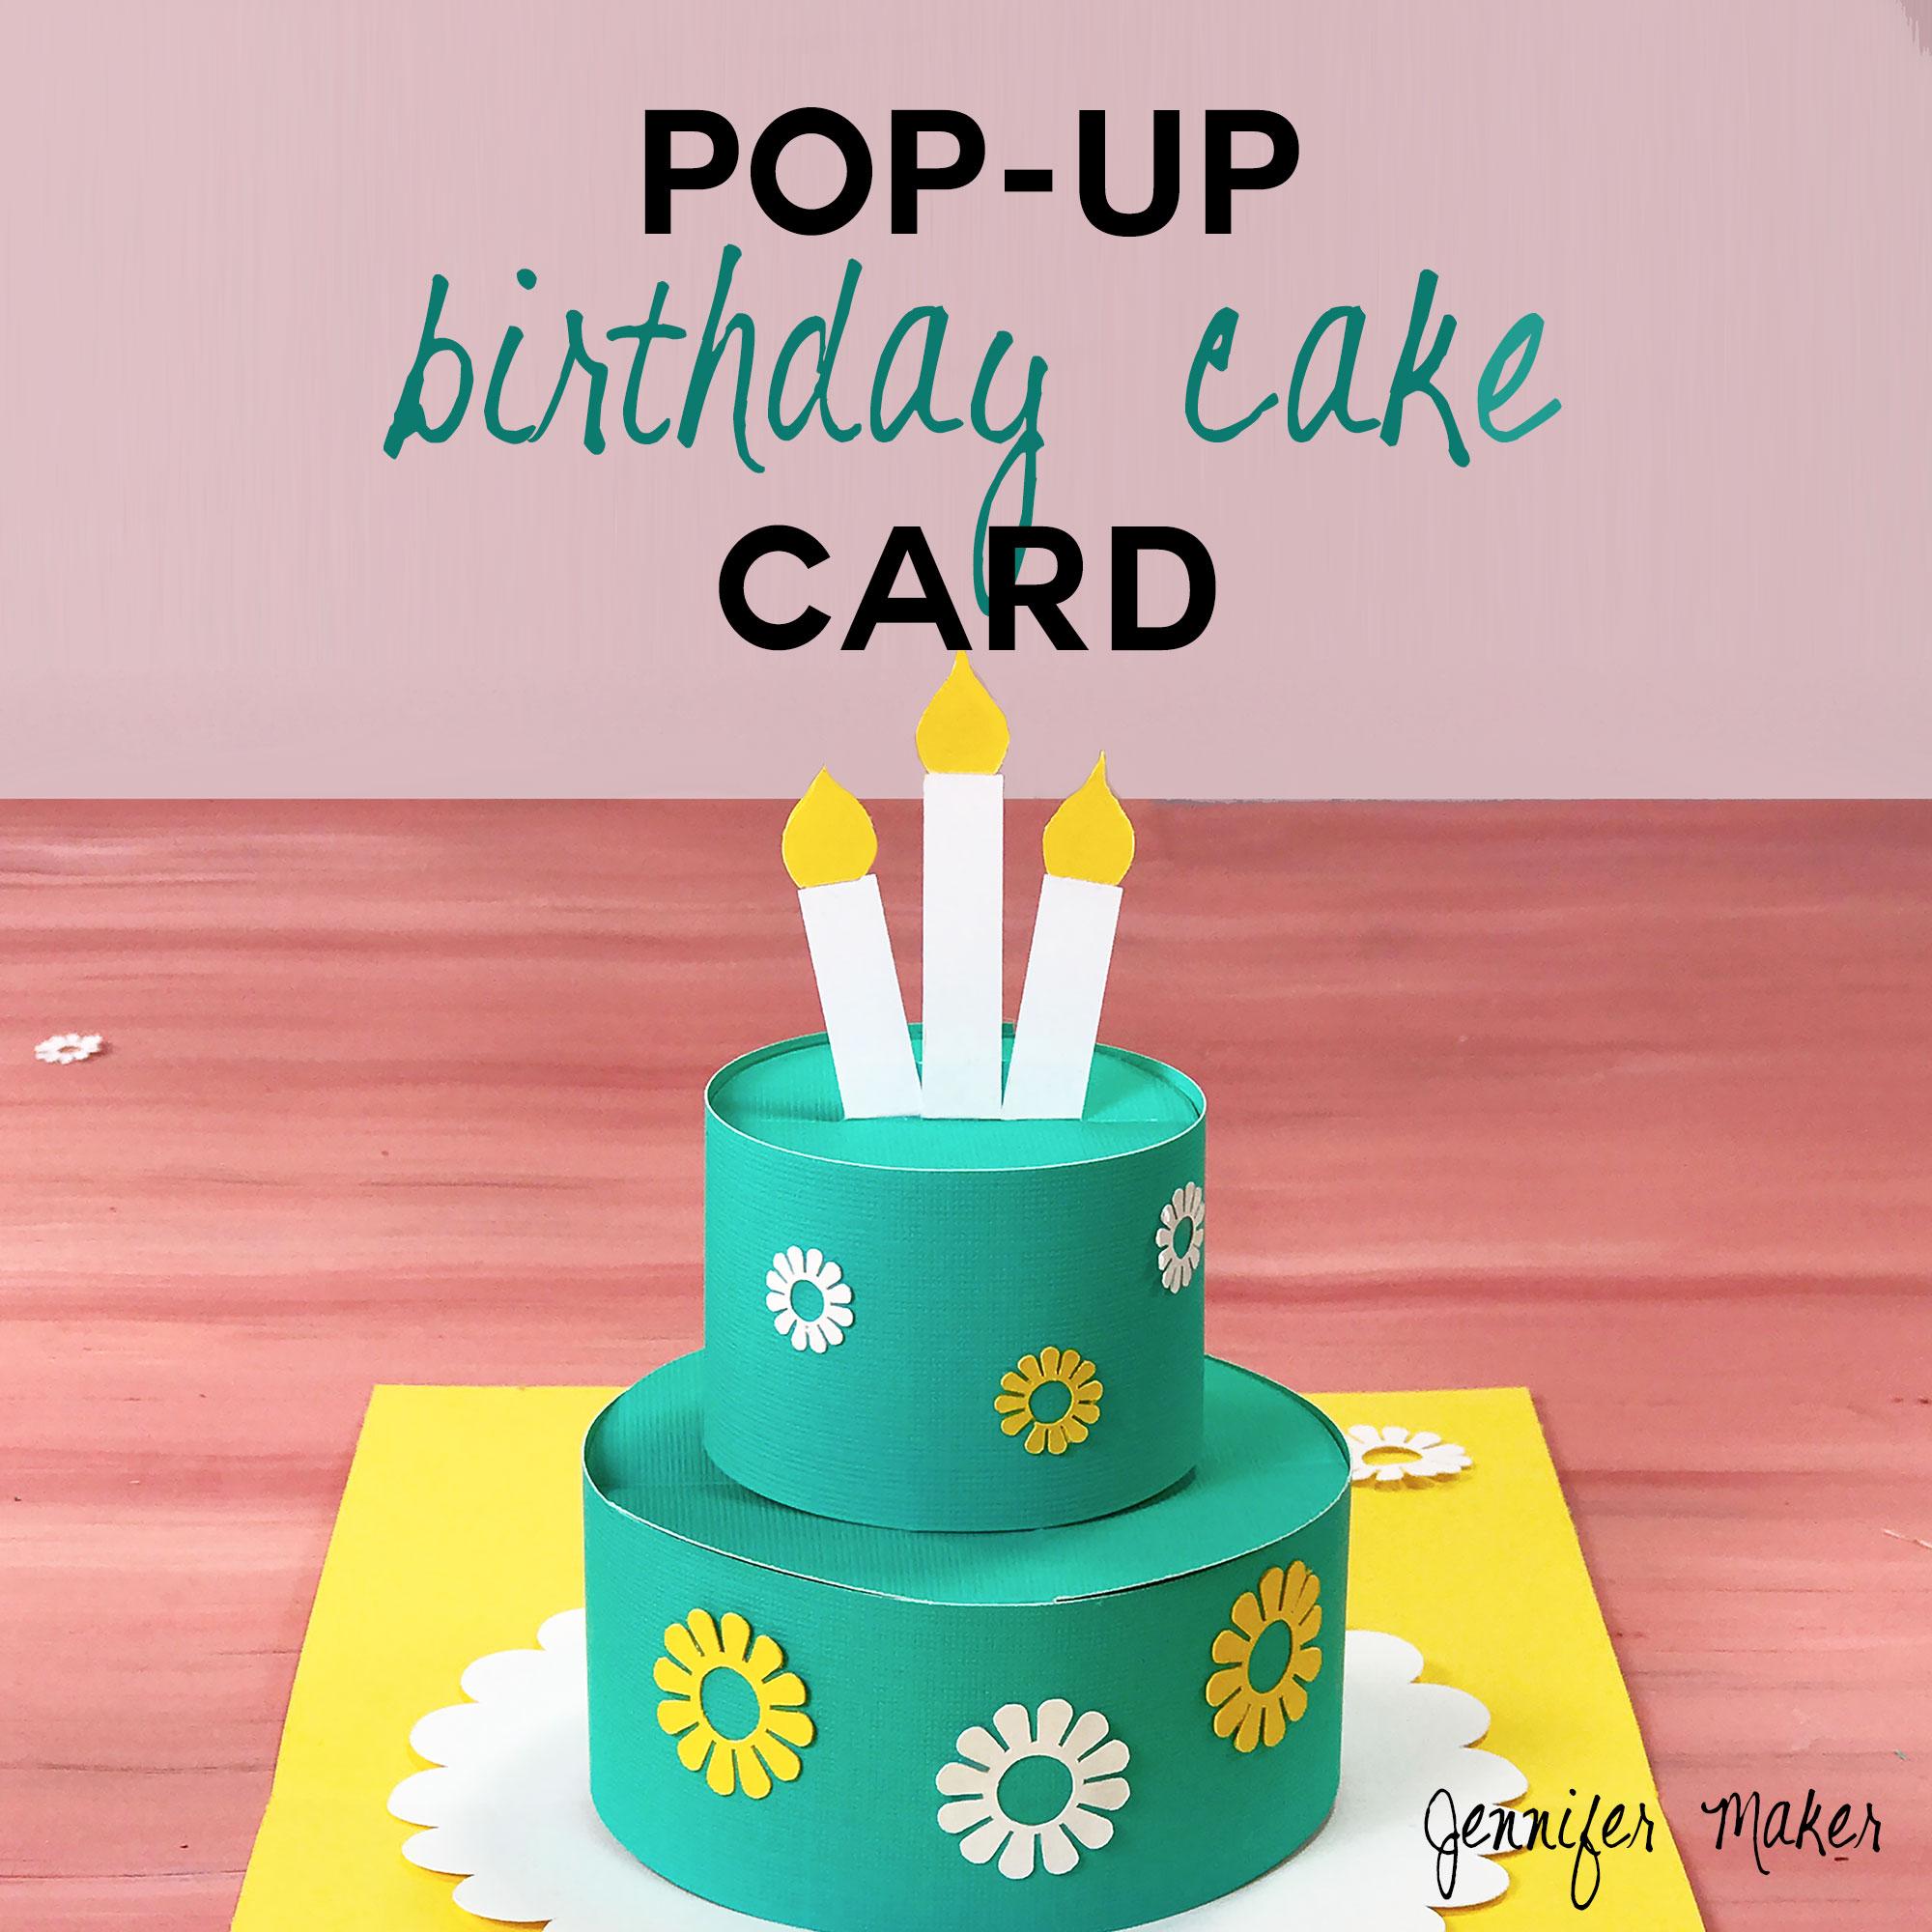 How To Make A Pop Up Birthday Cake Card Jennifer Maker